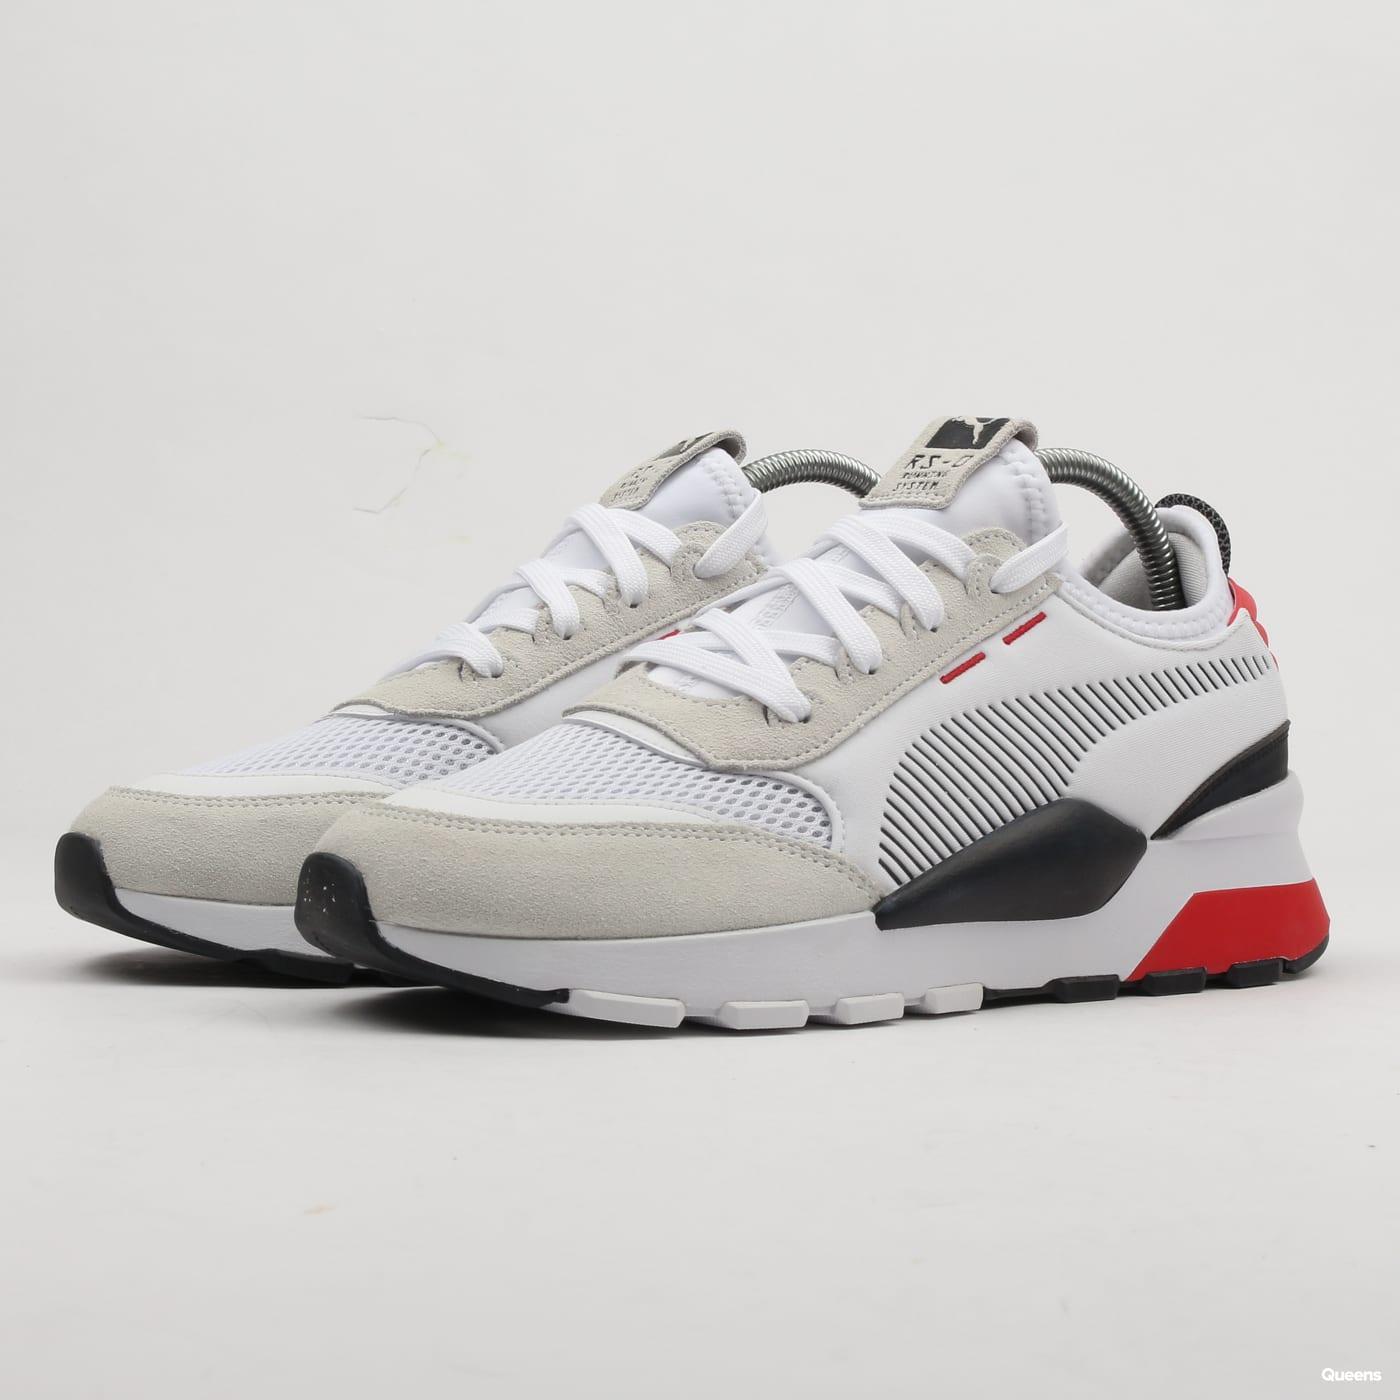 d6878a94d6eb Sneakers Puma RS-0 Winter INJ Toys (369469 01)– Queens 💚